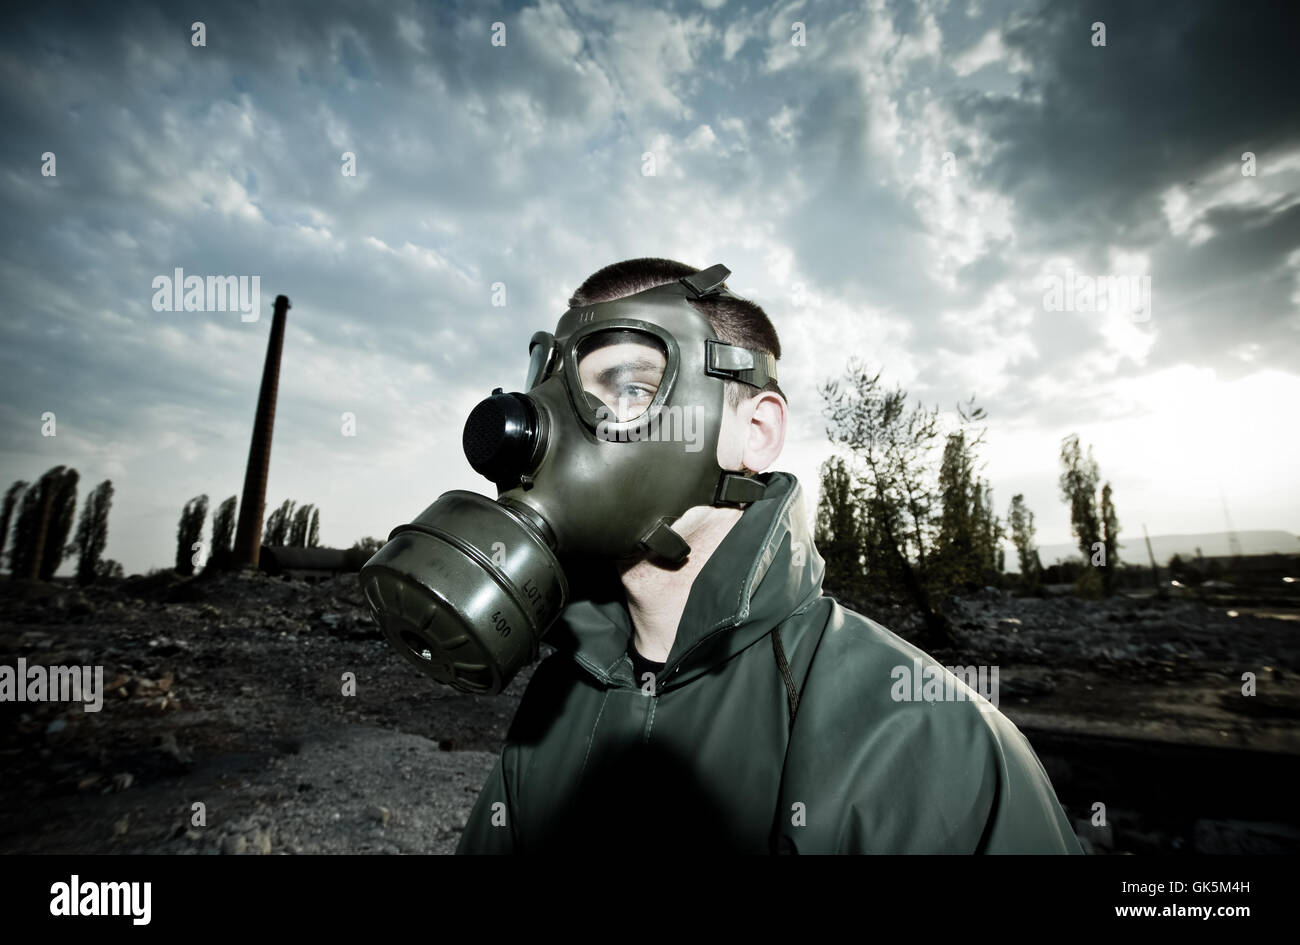 Respiratore di emergenza gas mask Immagini Stock